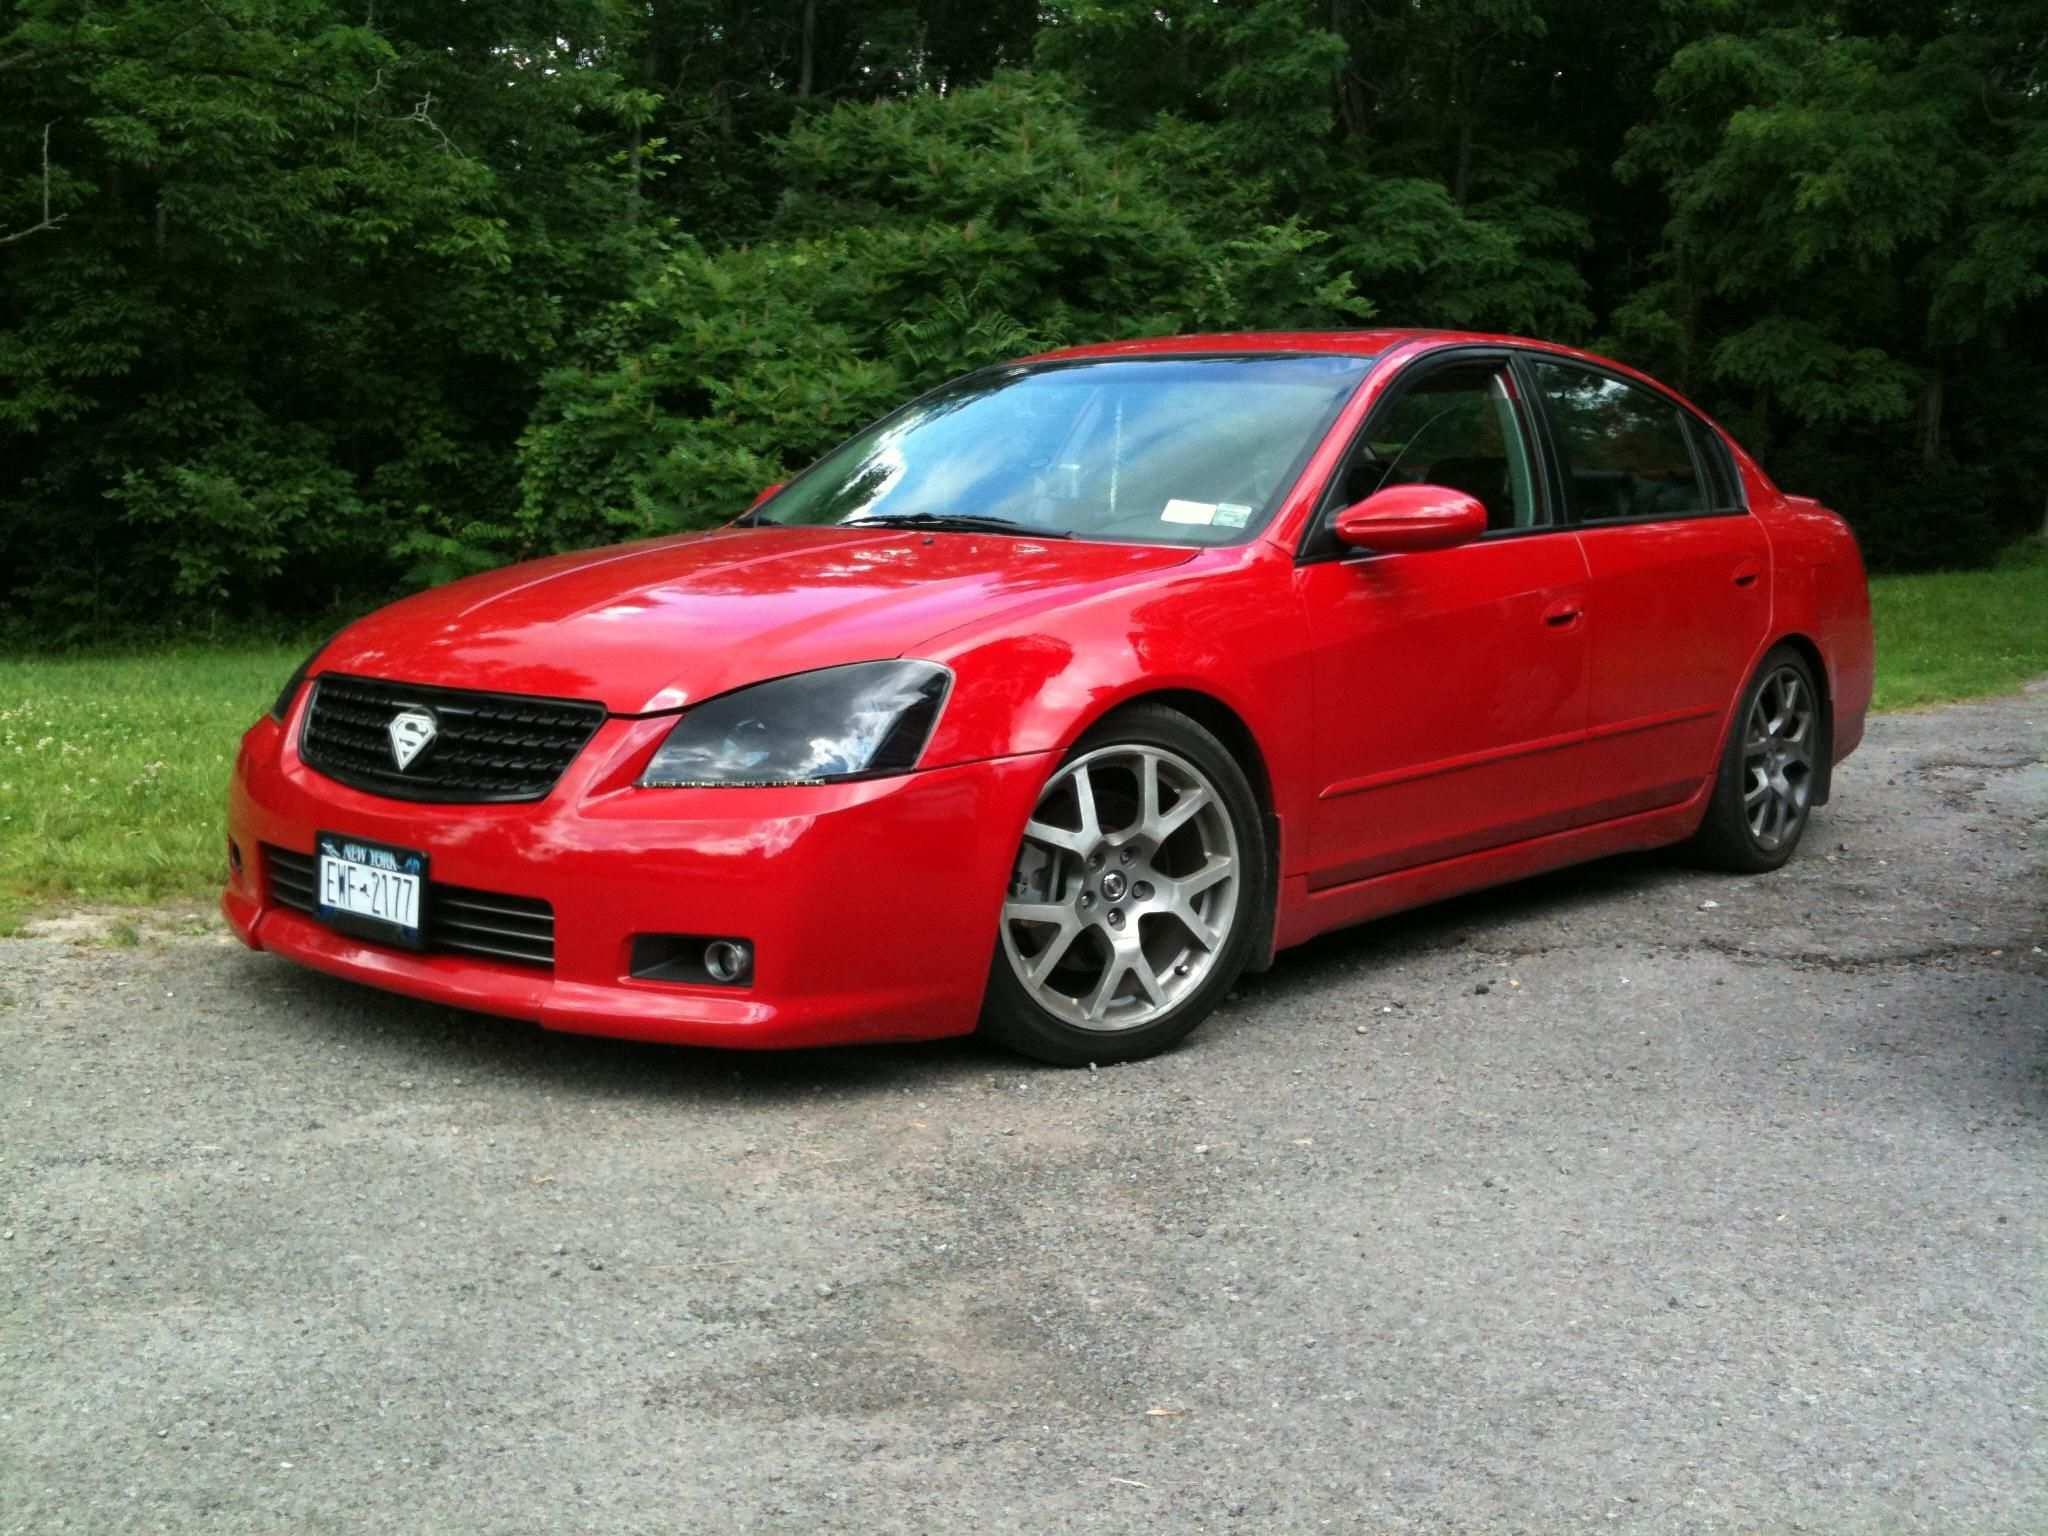 58 All New Nissan Altima Se R Interior with Nissan Altima Se R